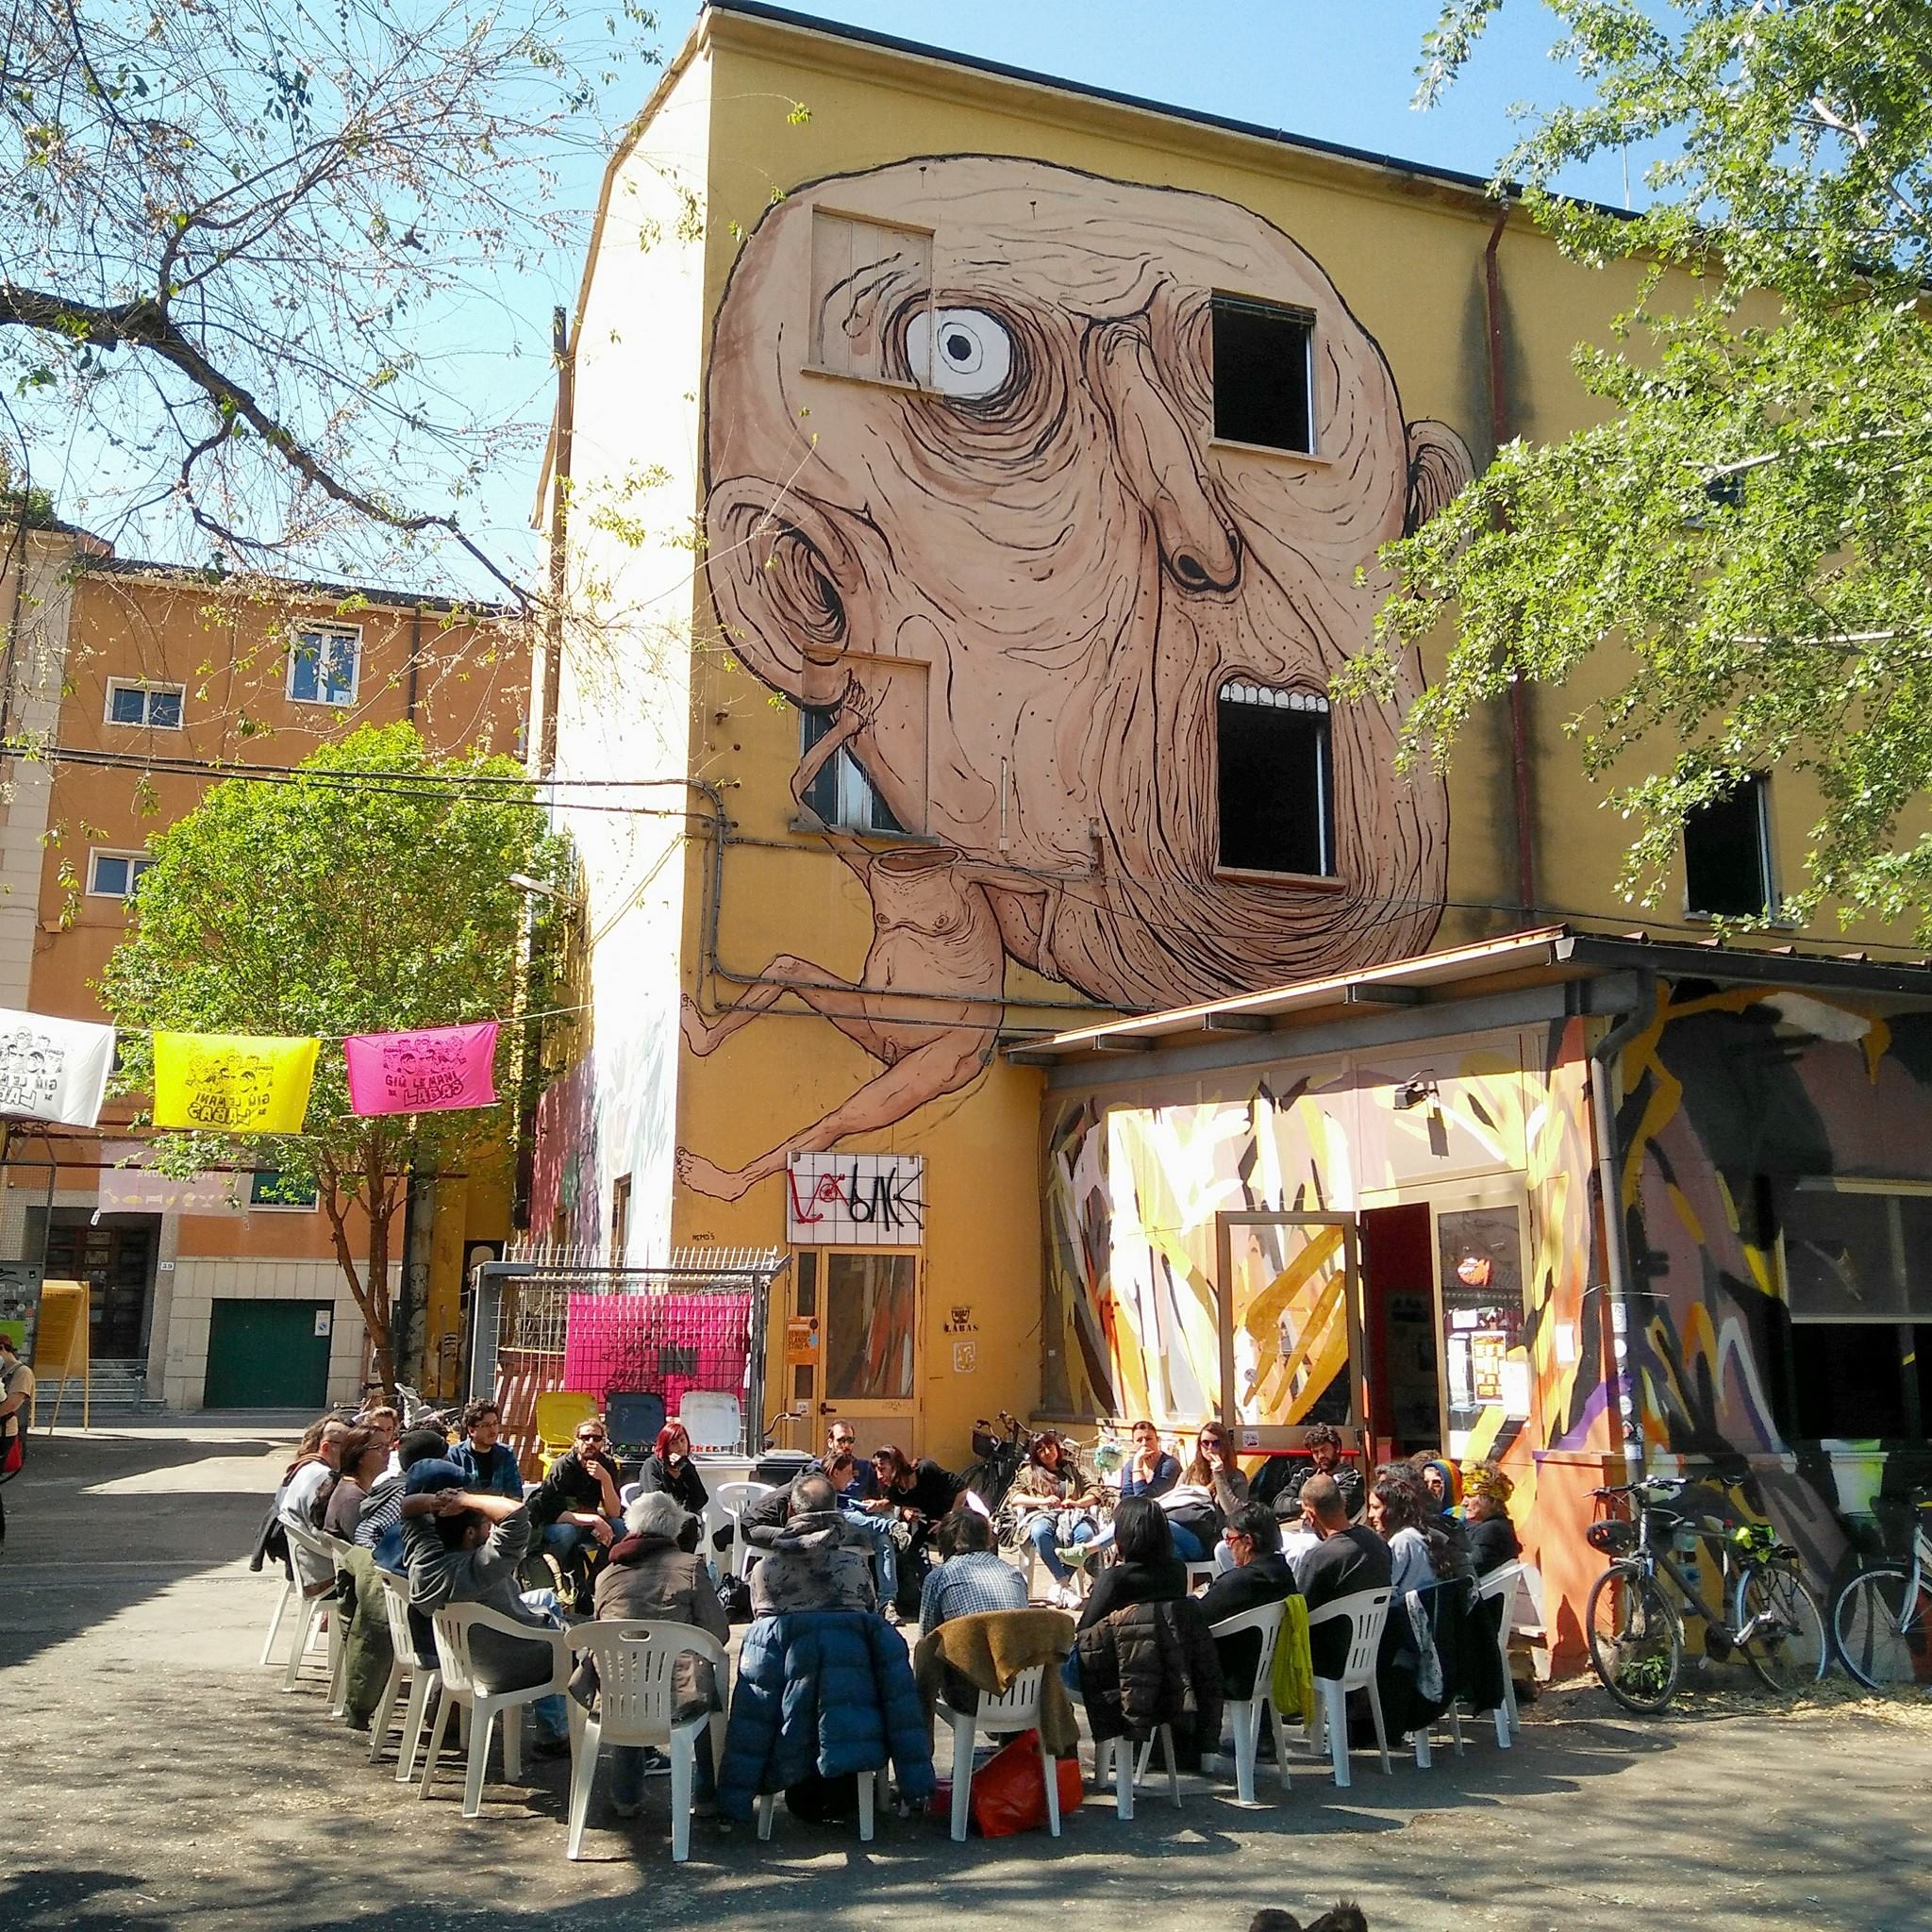 Bologna oggi è RESISTENTE in difesa di Labàs